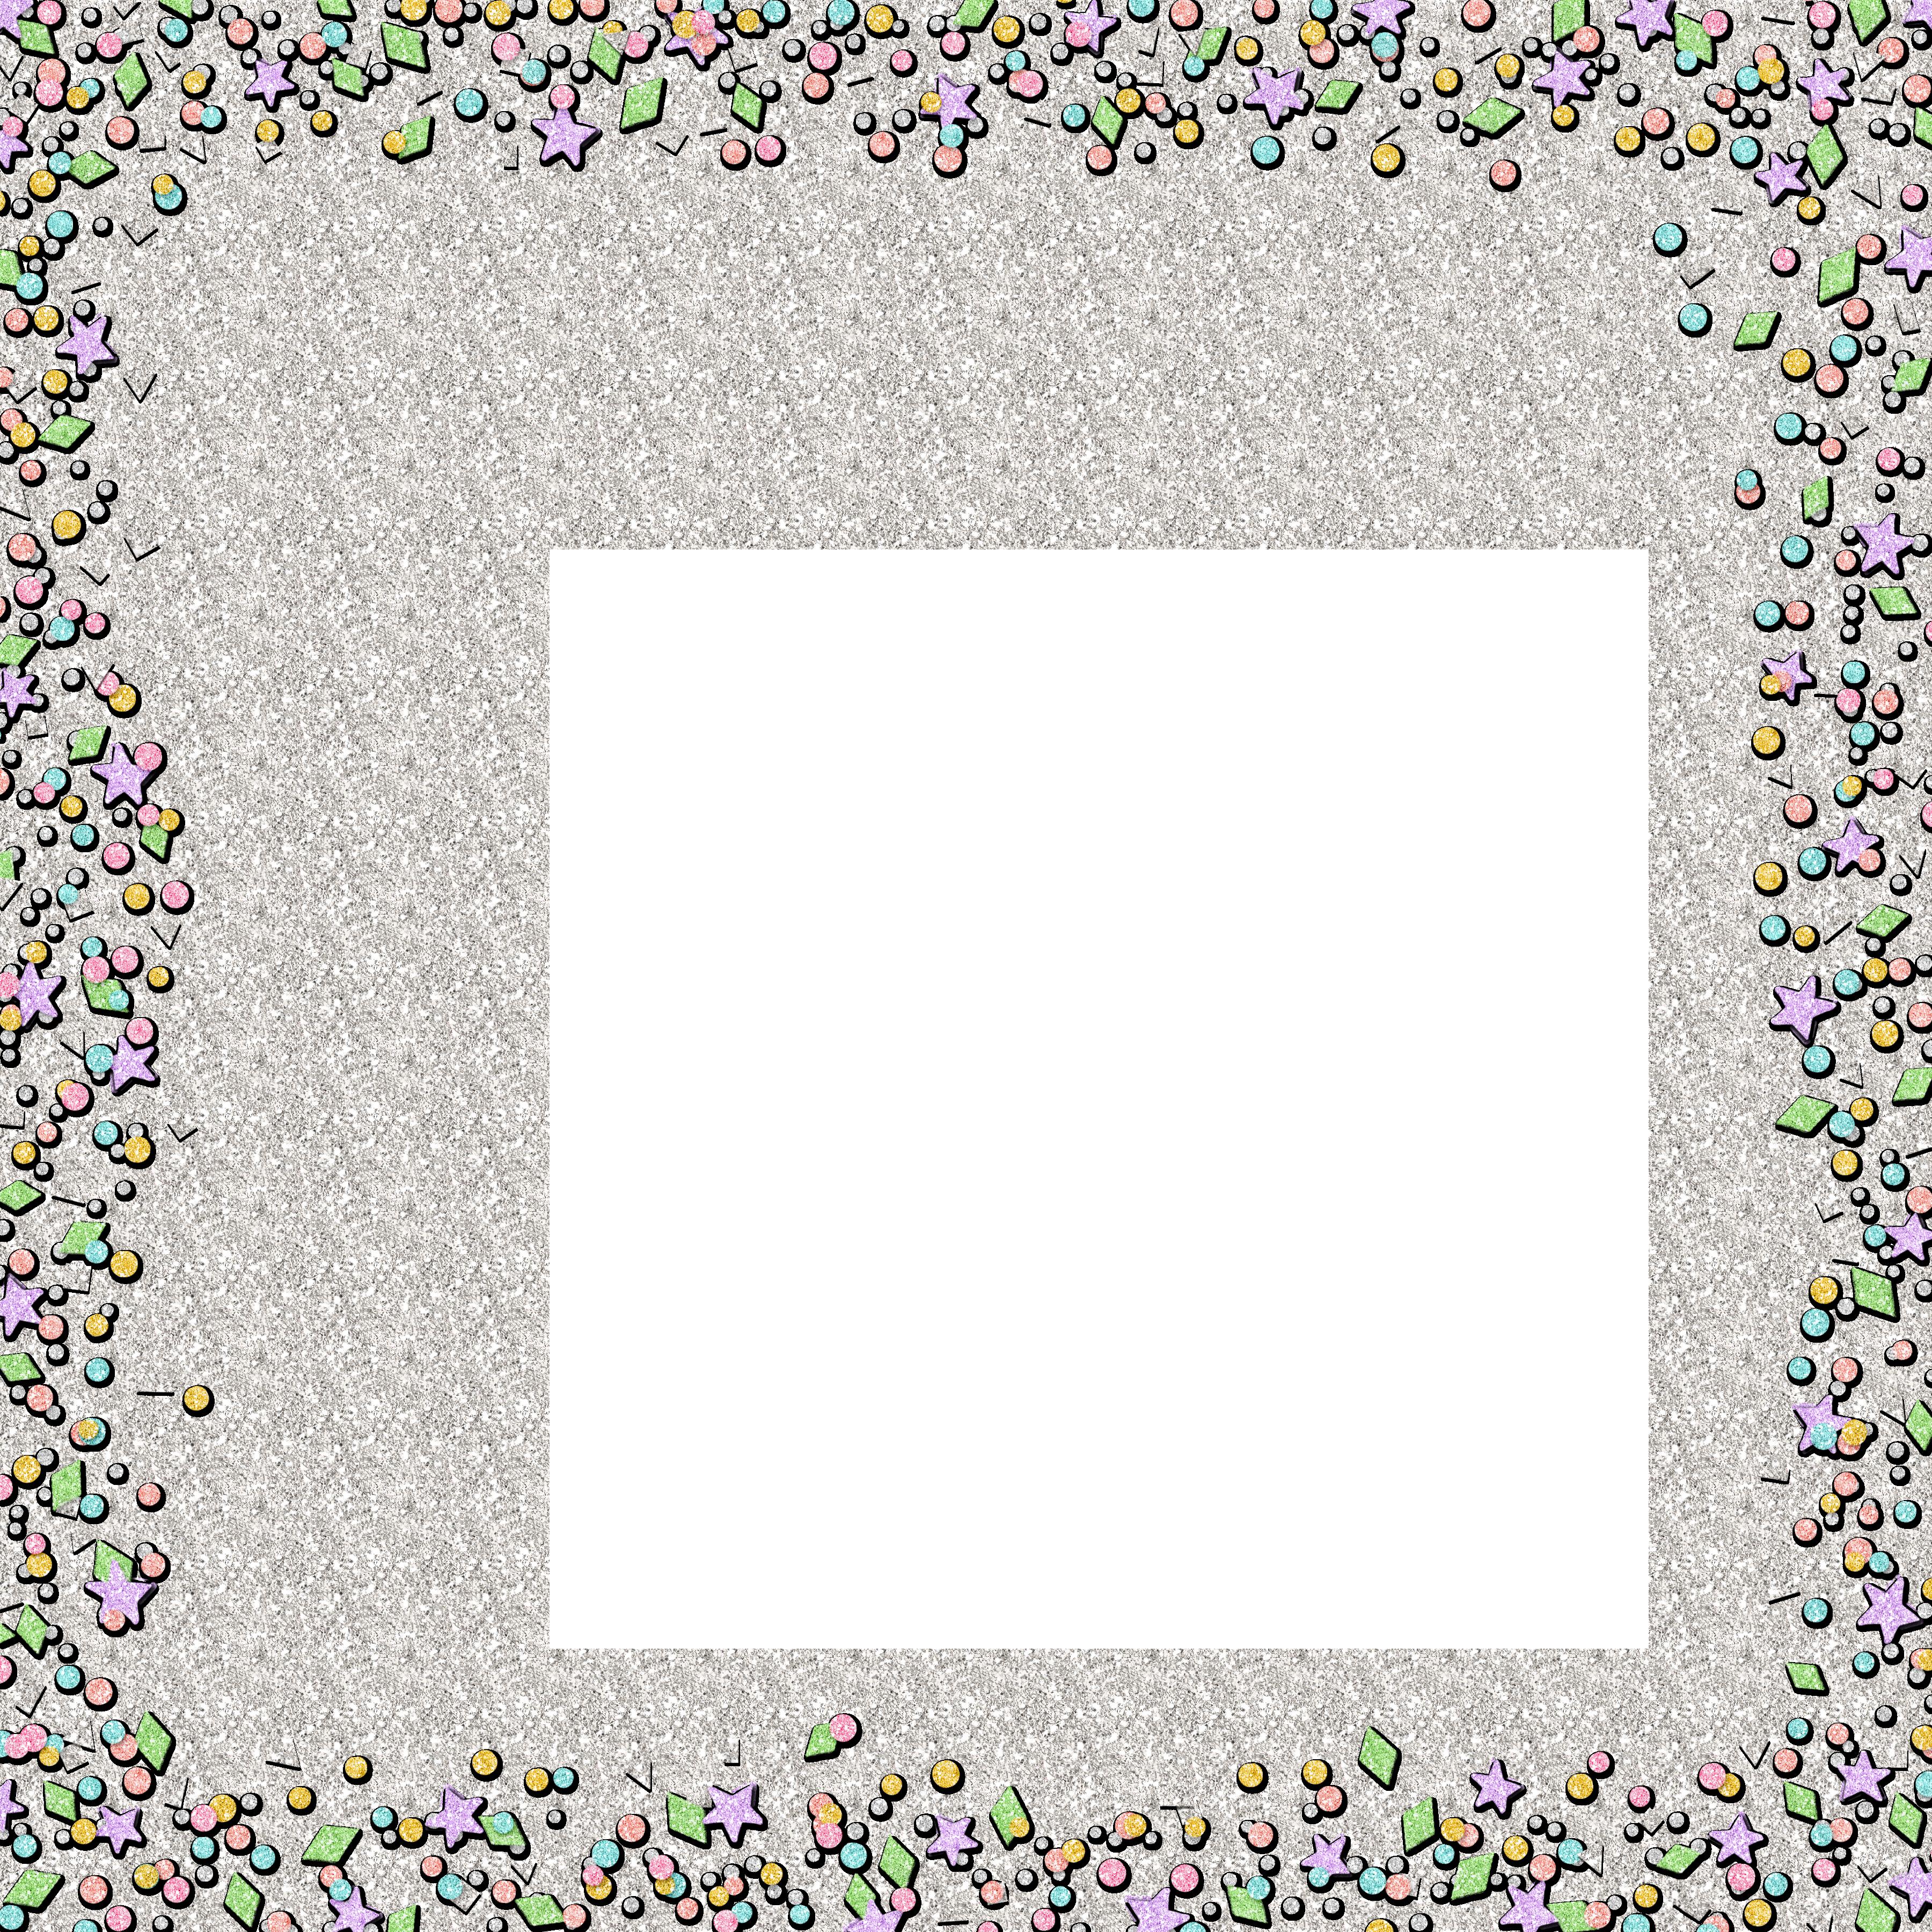 Loadtve. Confetti clipart tumblr transparent